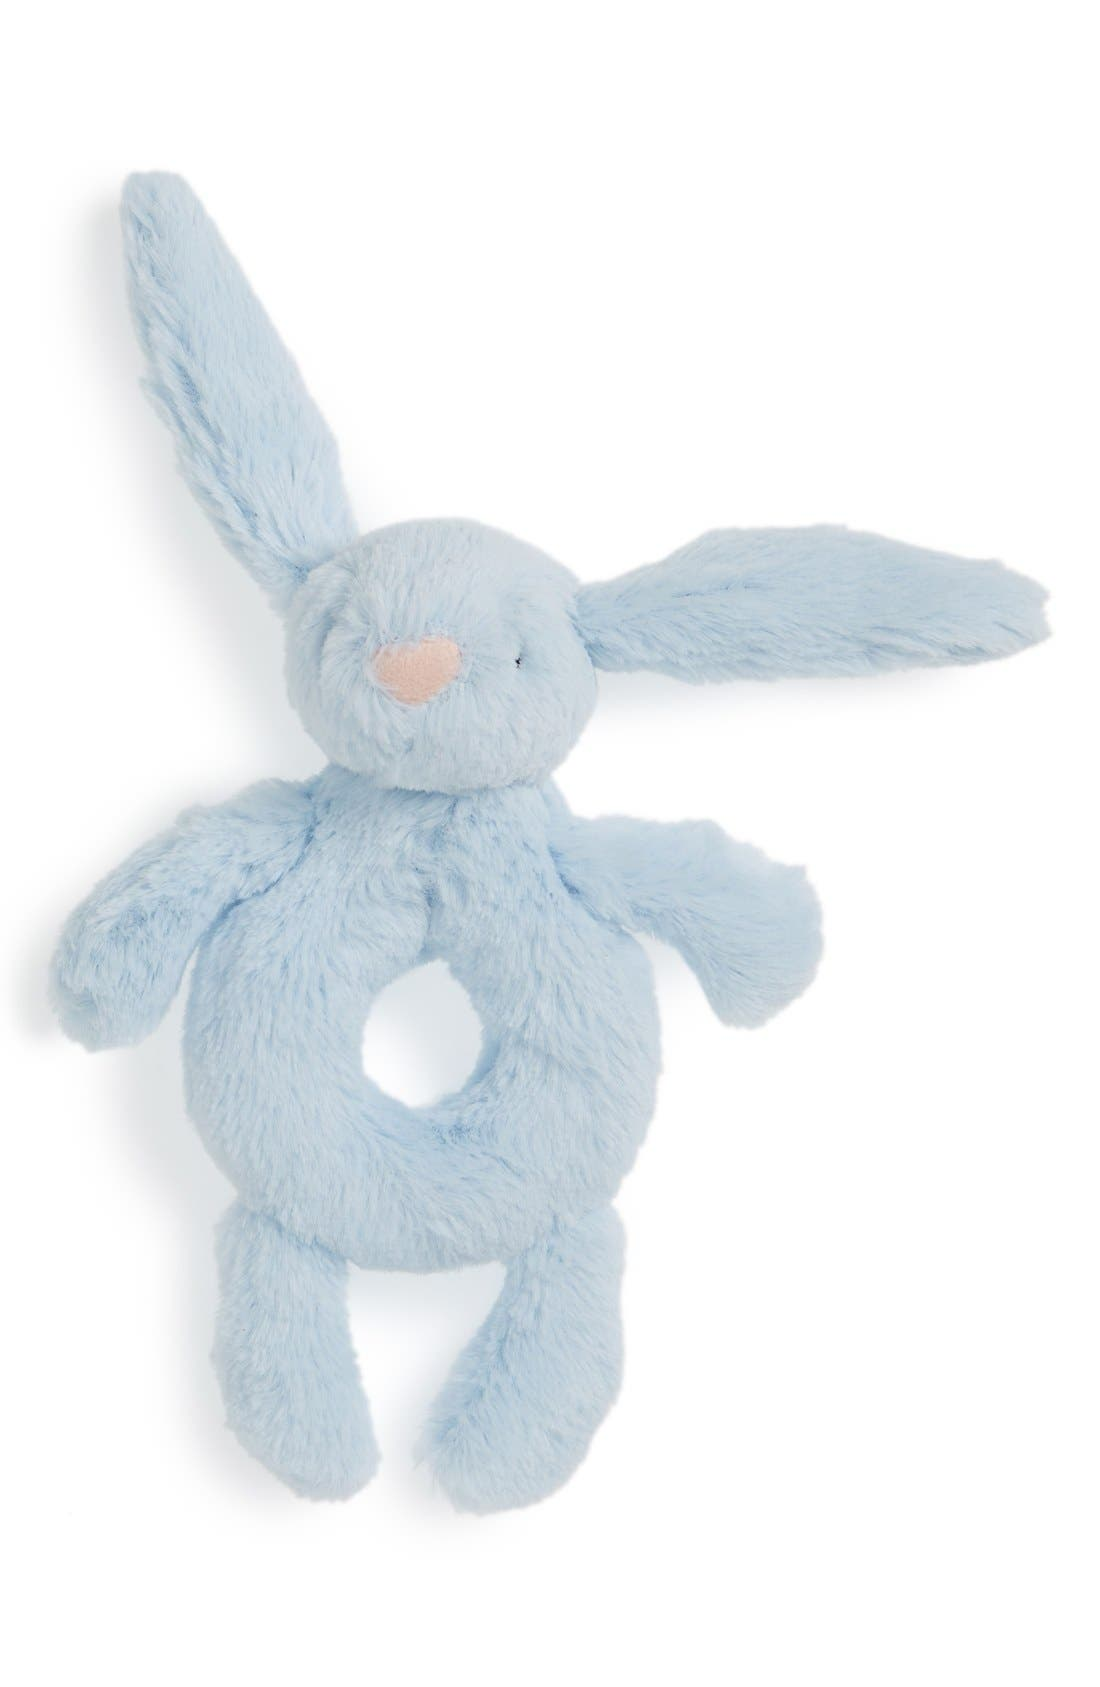 'Bashful Bunny' Grabber Rattle,                             Main thumbnail 1, color,                             BLUE